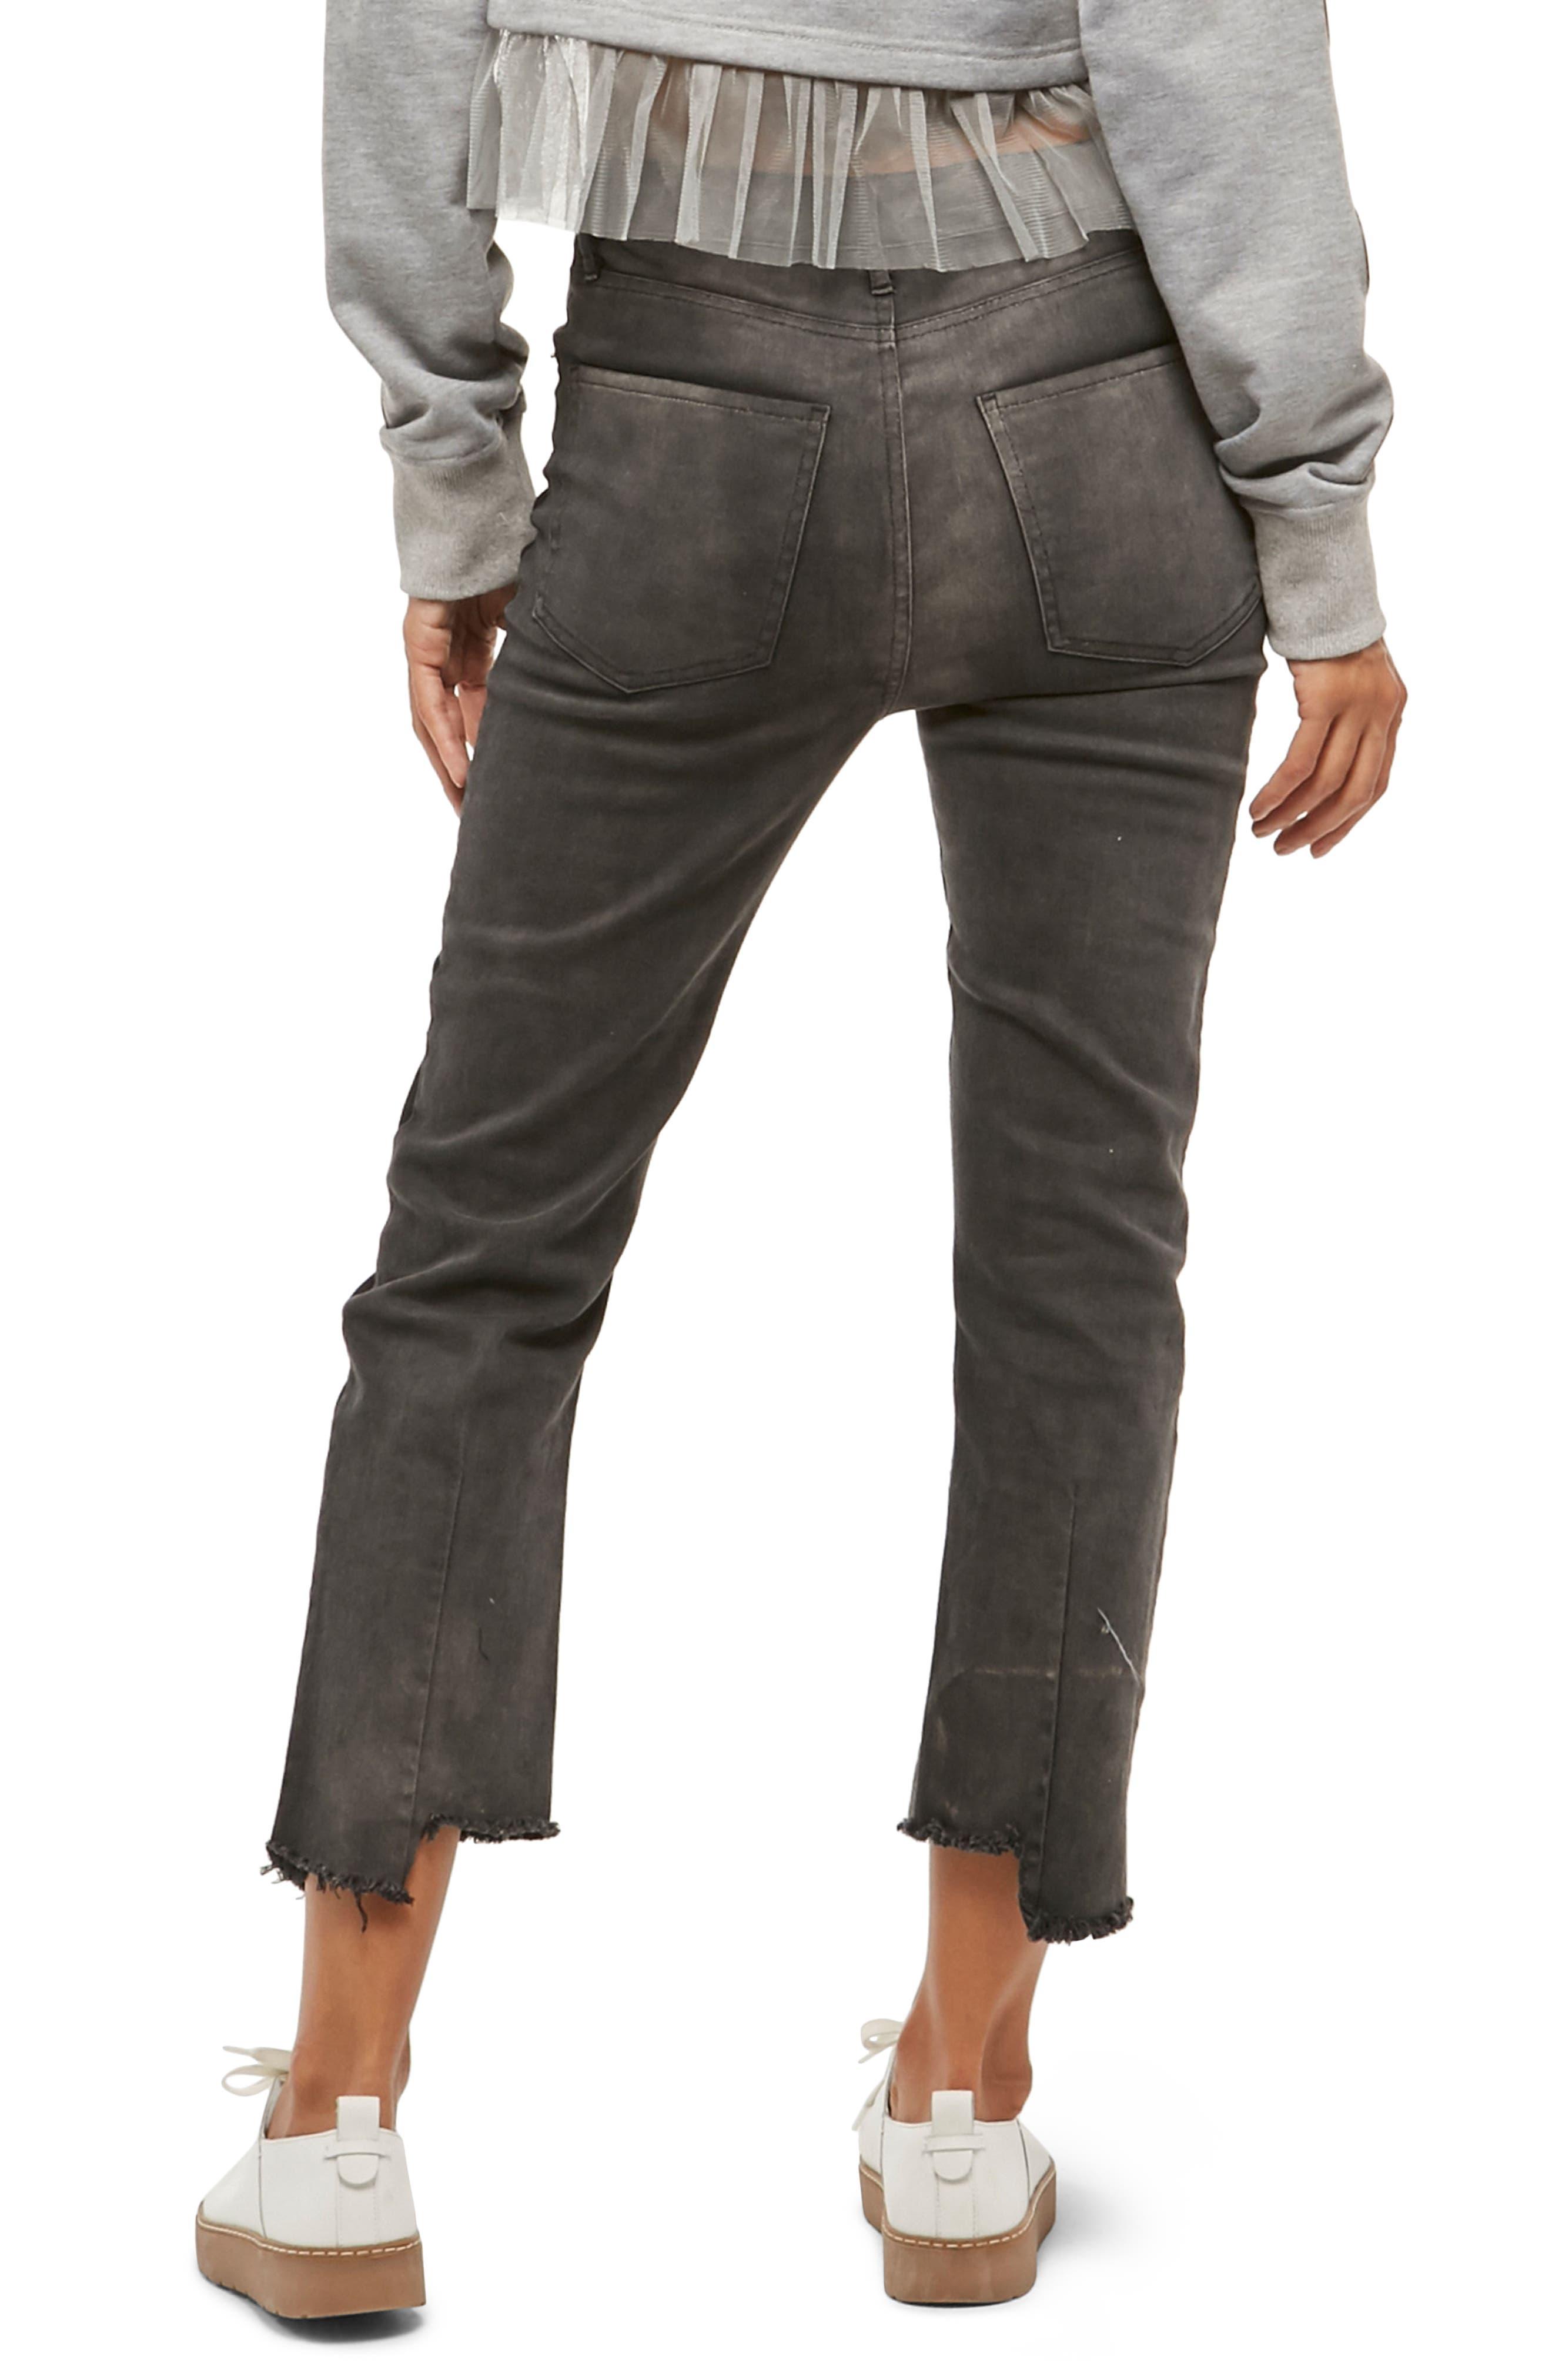 Alpha & Omega Two-Tone Crop Jeans,                             Alternate thumbnail 2, color,                             Black